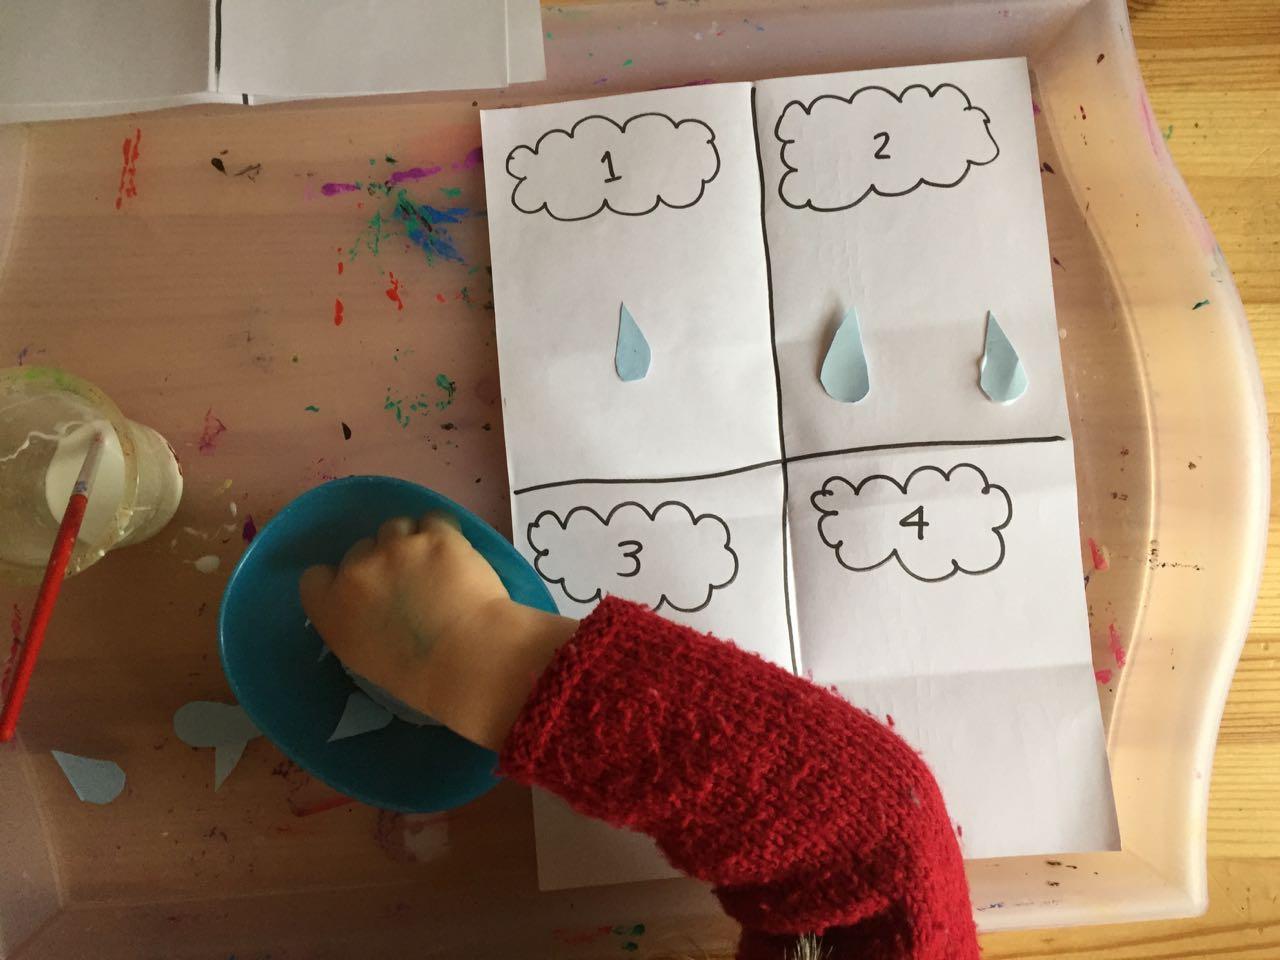 rain3 - 1